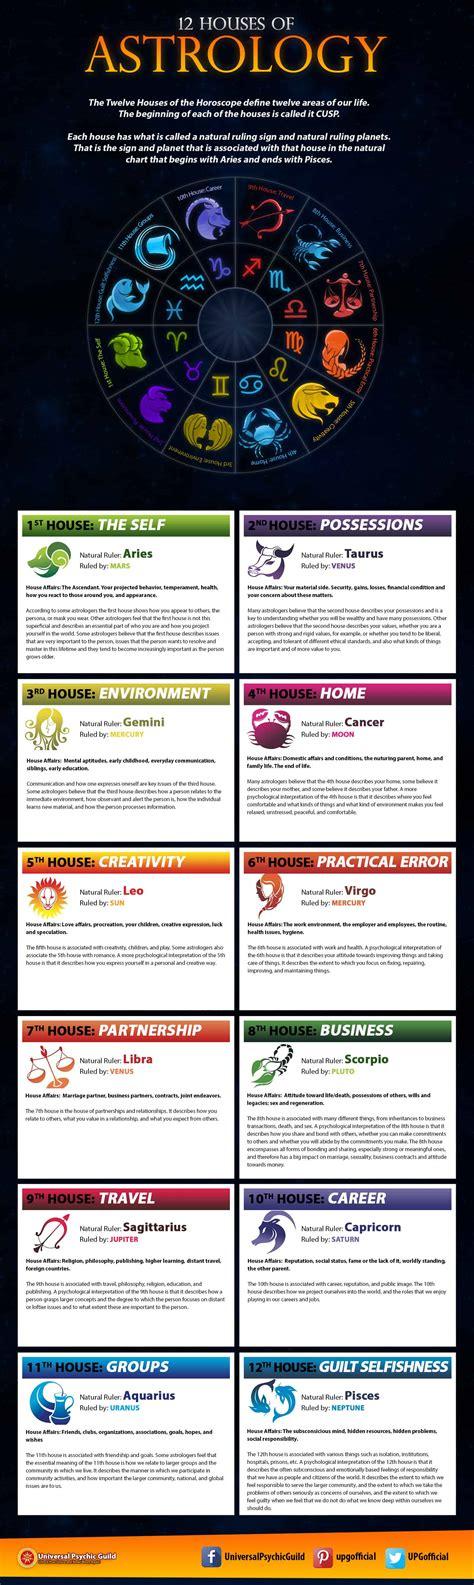 horoscopes  definitive guide